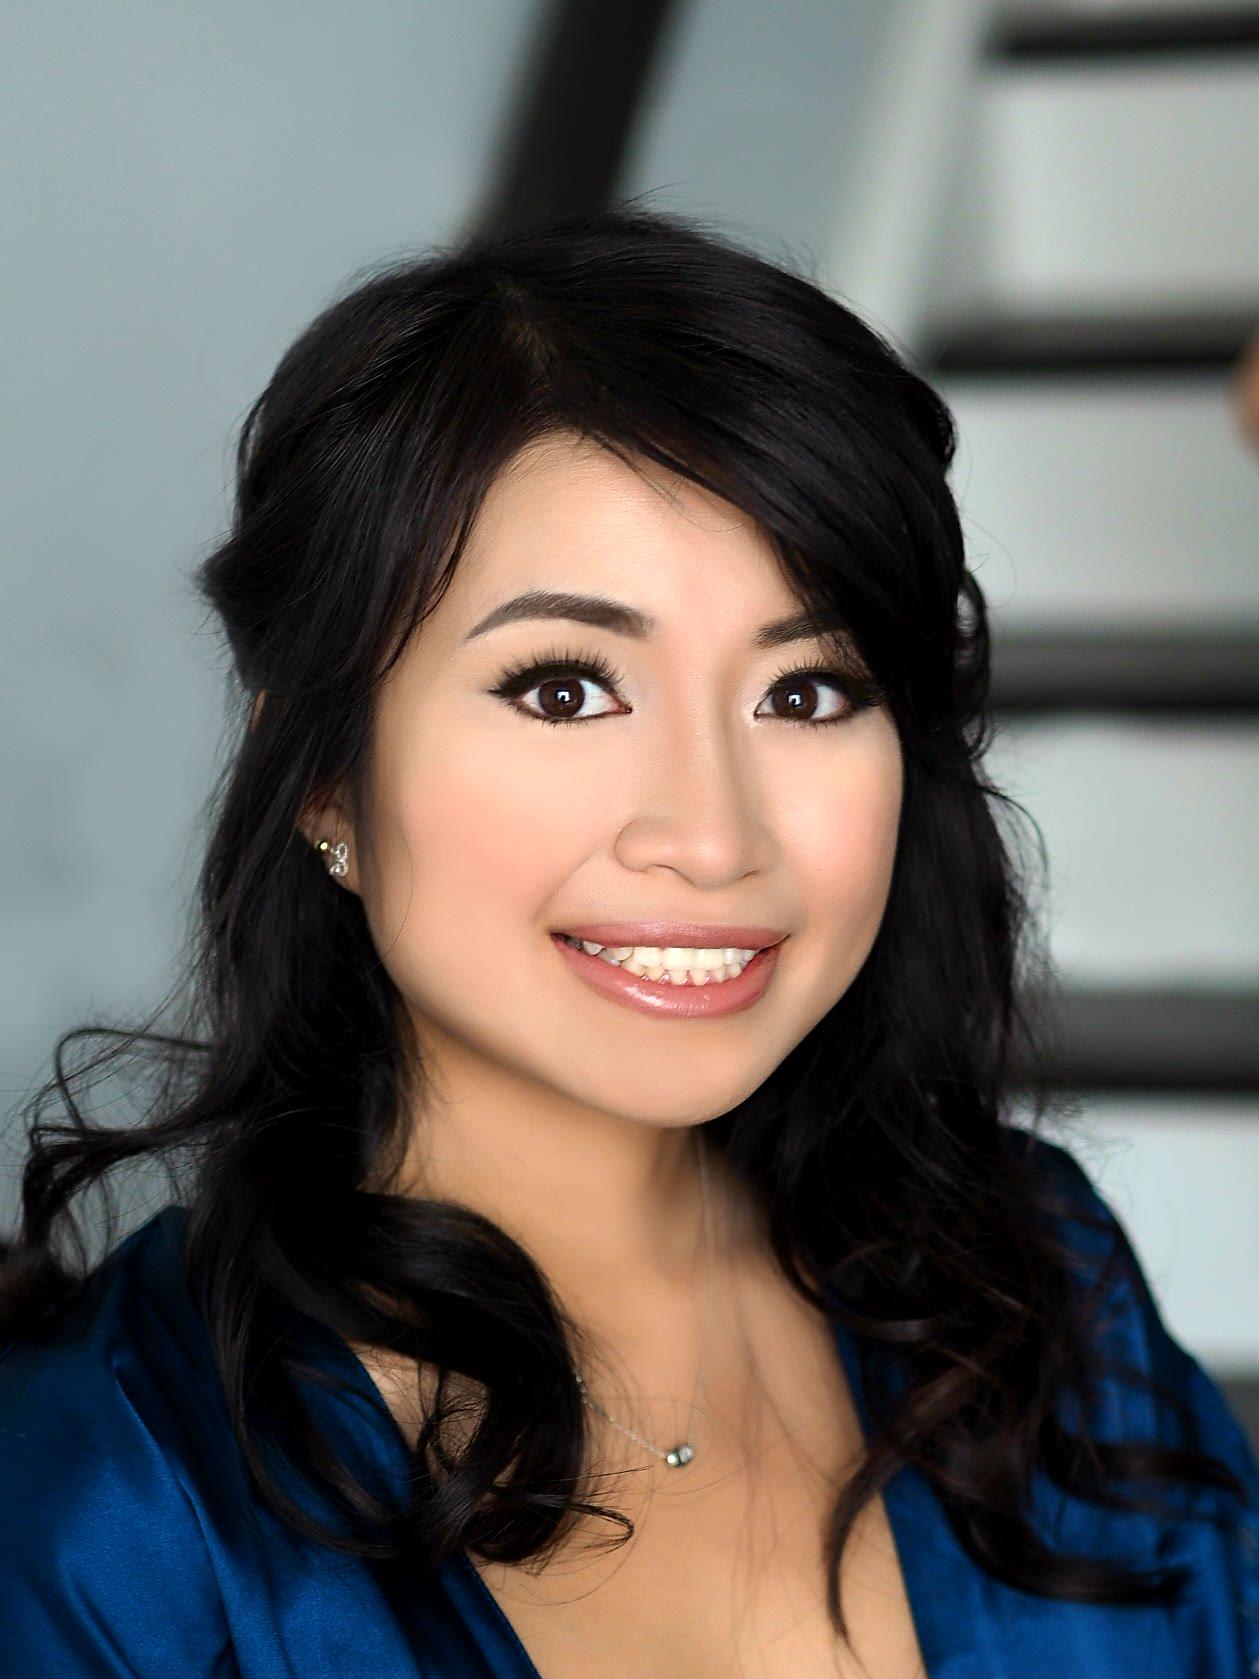 Toronto makeup artist Vietnamese